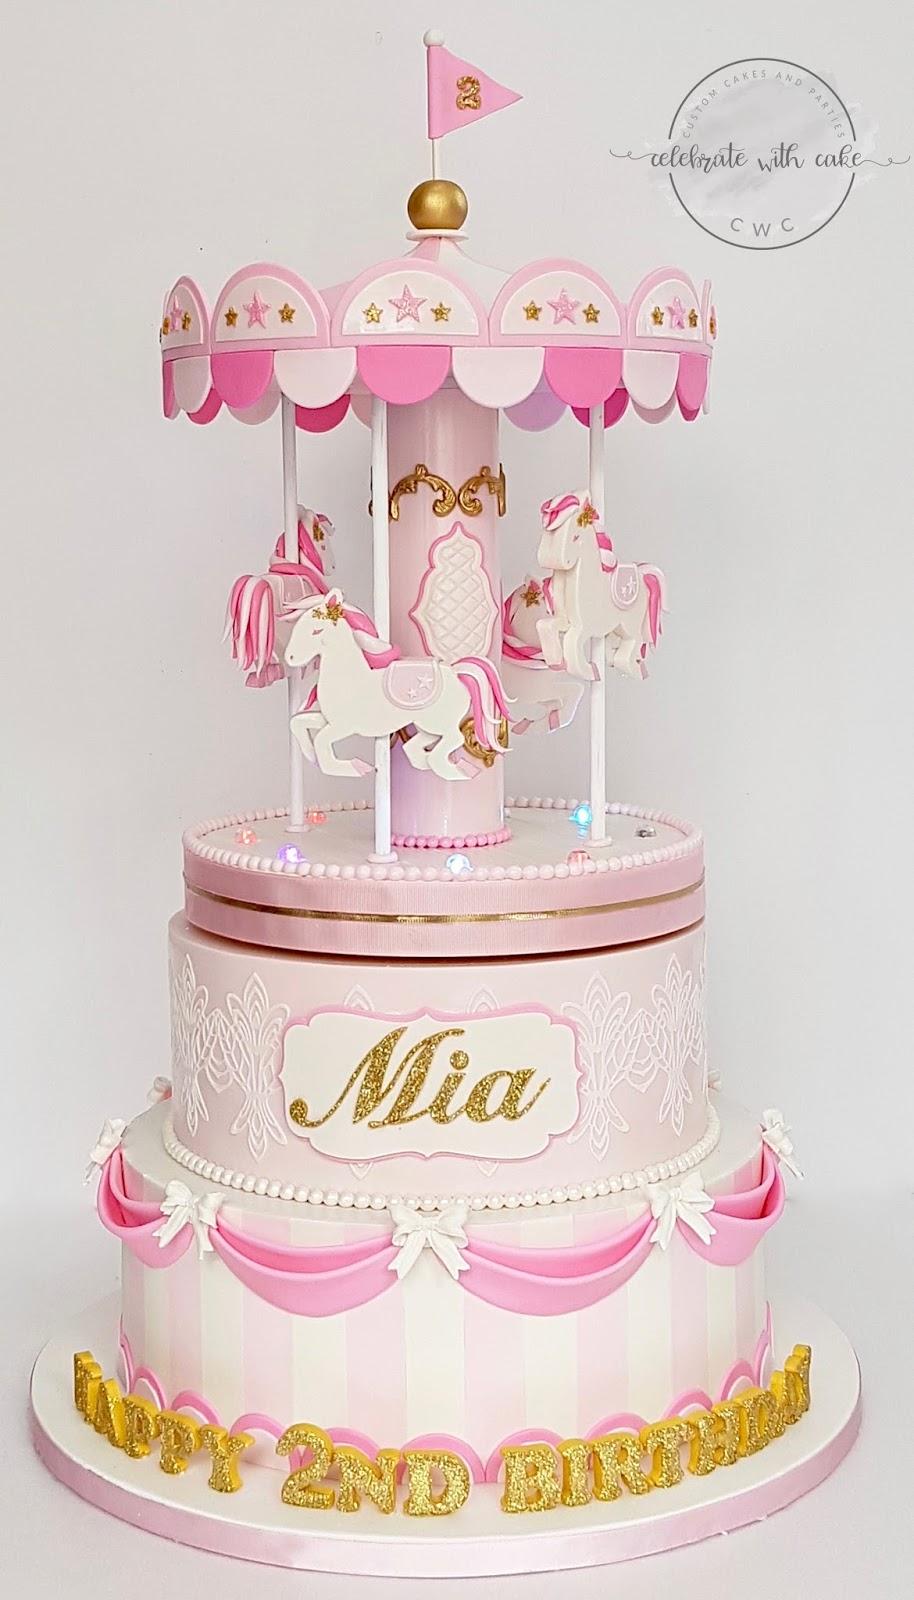 Stupendous Celebrate With Cake Rotating Carousel 1St Birthday Cake Personalised Birthday Cards Akebfashionlily Jamesorg